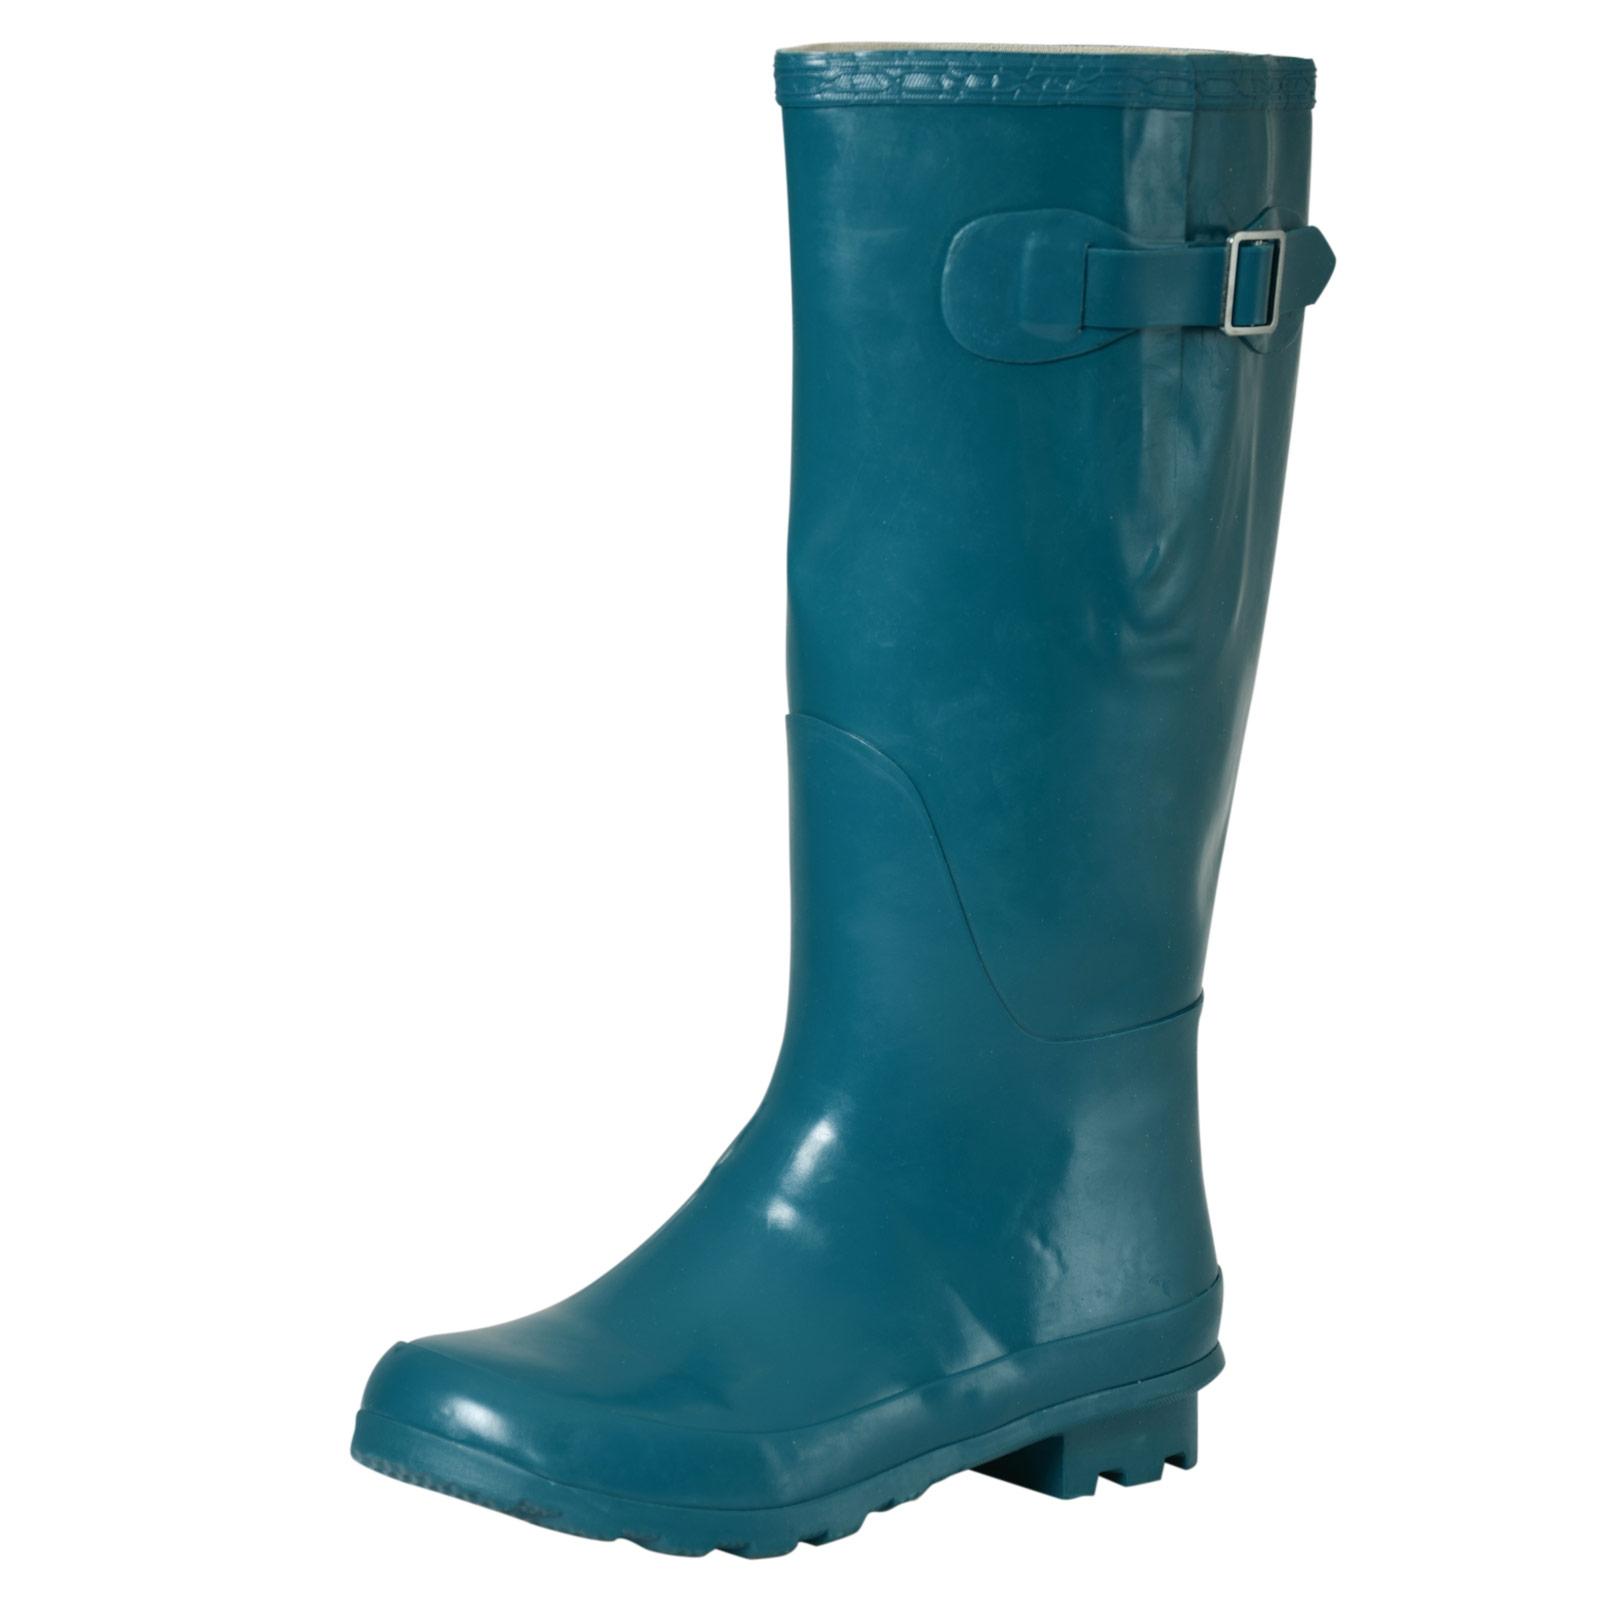 Ladies Girls Coloured Gloss Wellington Boots Fashion Festival Waterproof Wellies